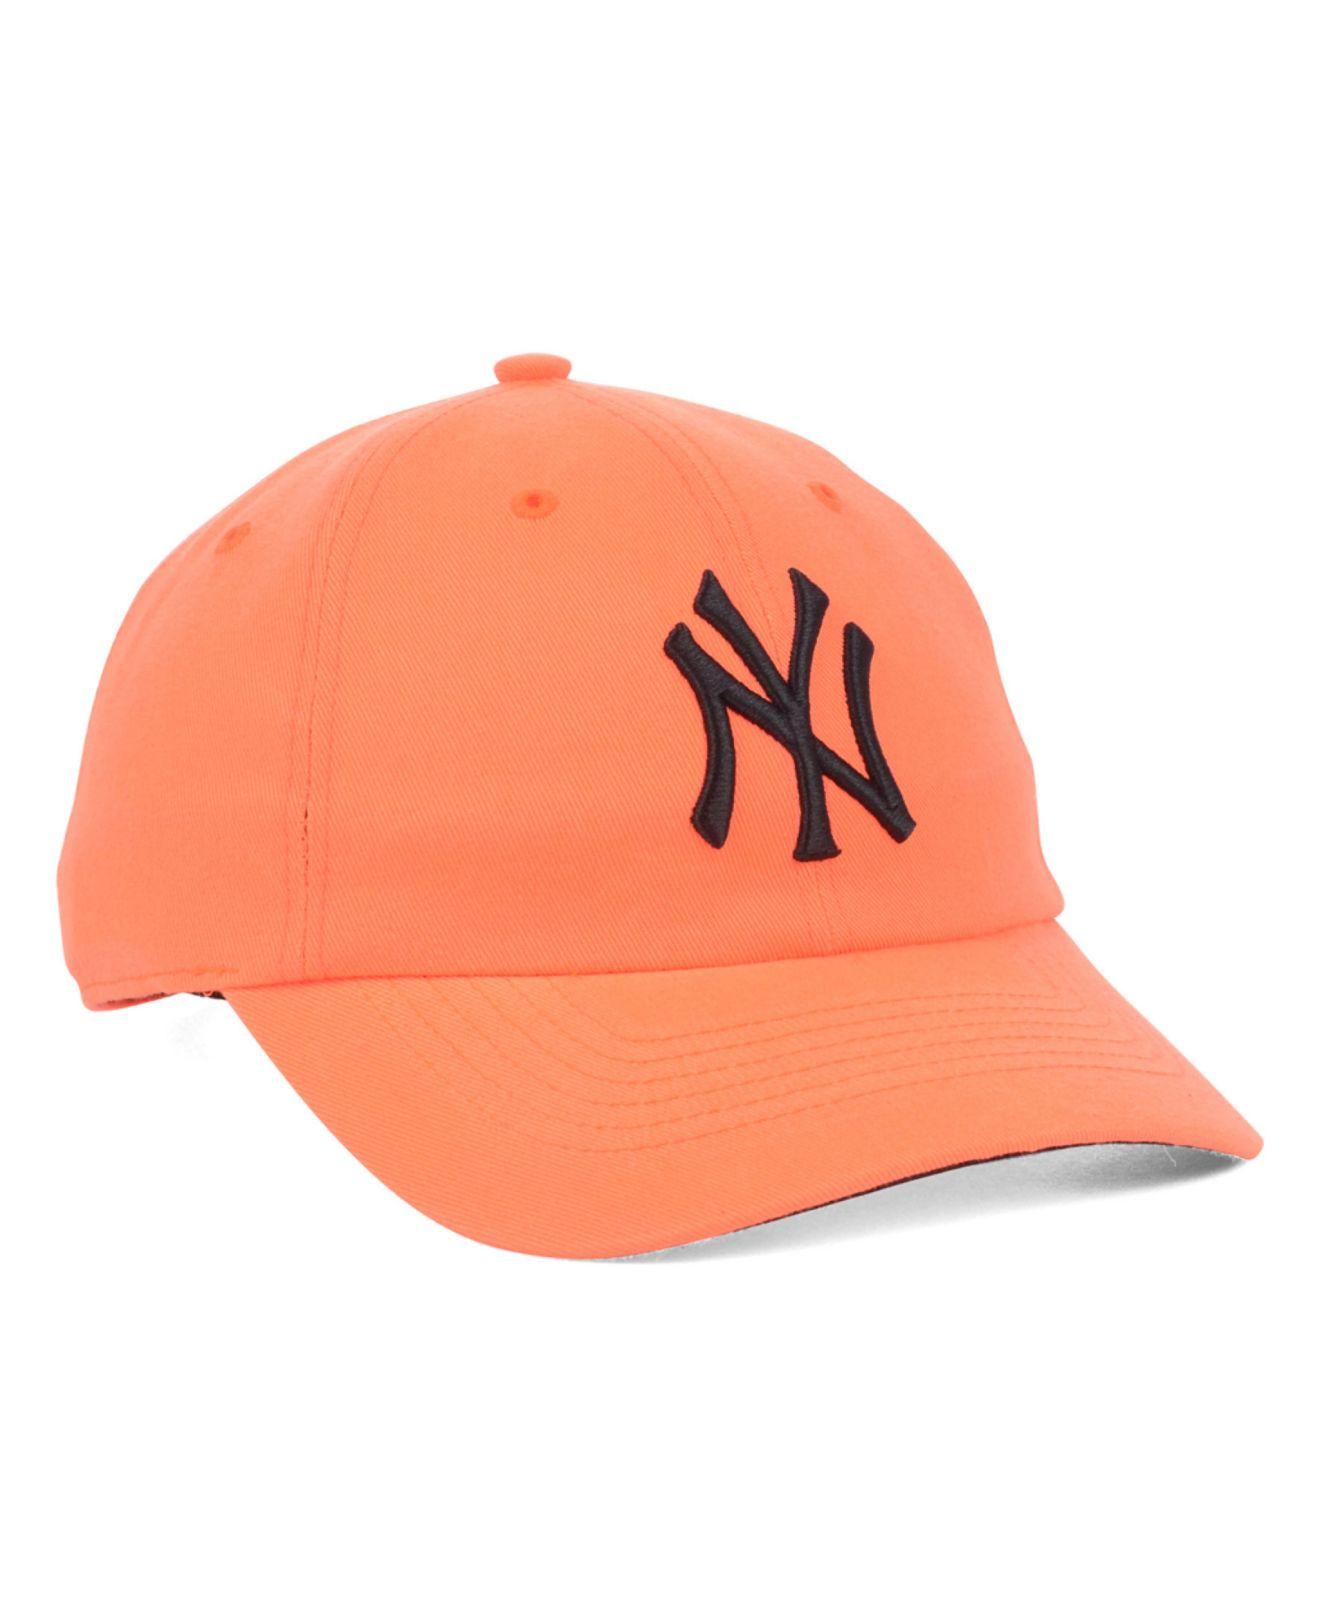 088054a65c6 Lyst - 47 Brand Women S New York Yankees Neon Clean Up Cap in Orange